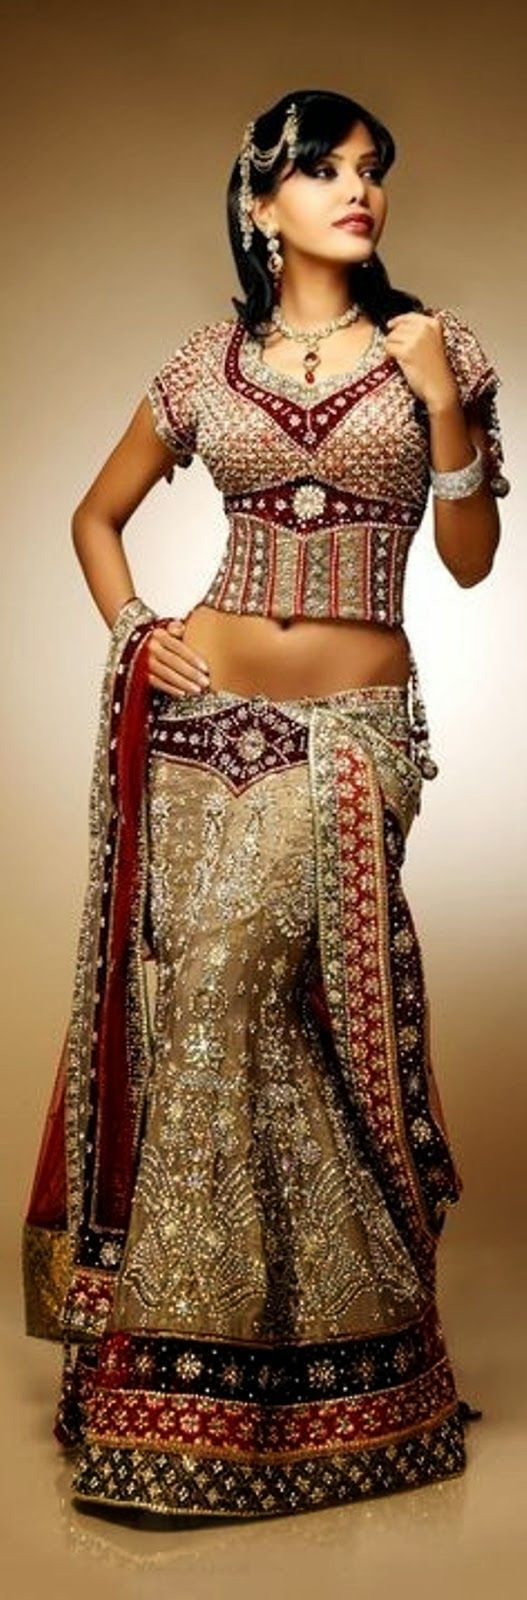 Hindu wedding dress  Indian Wedding Dresses  Especially Design for Girls and Womenus